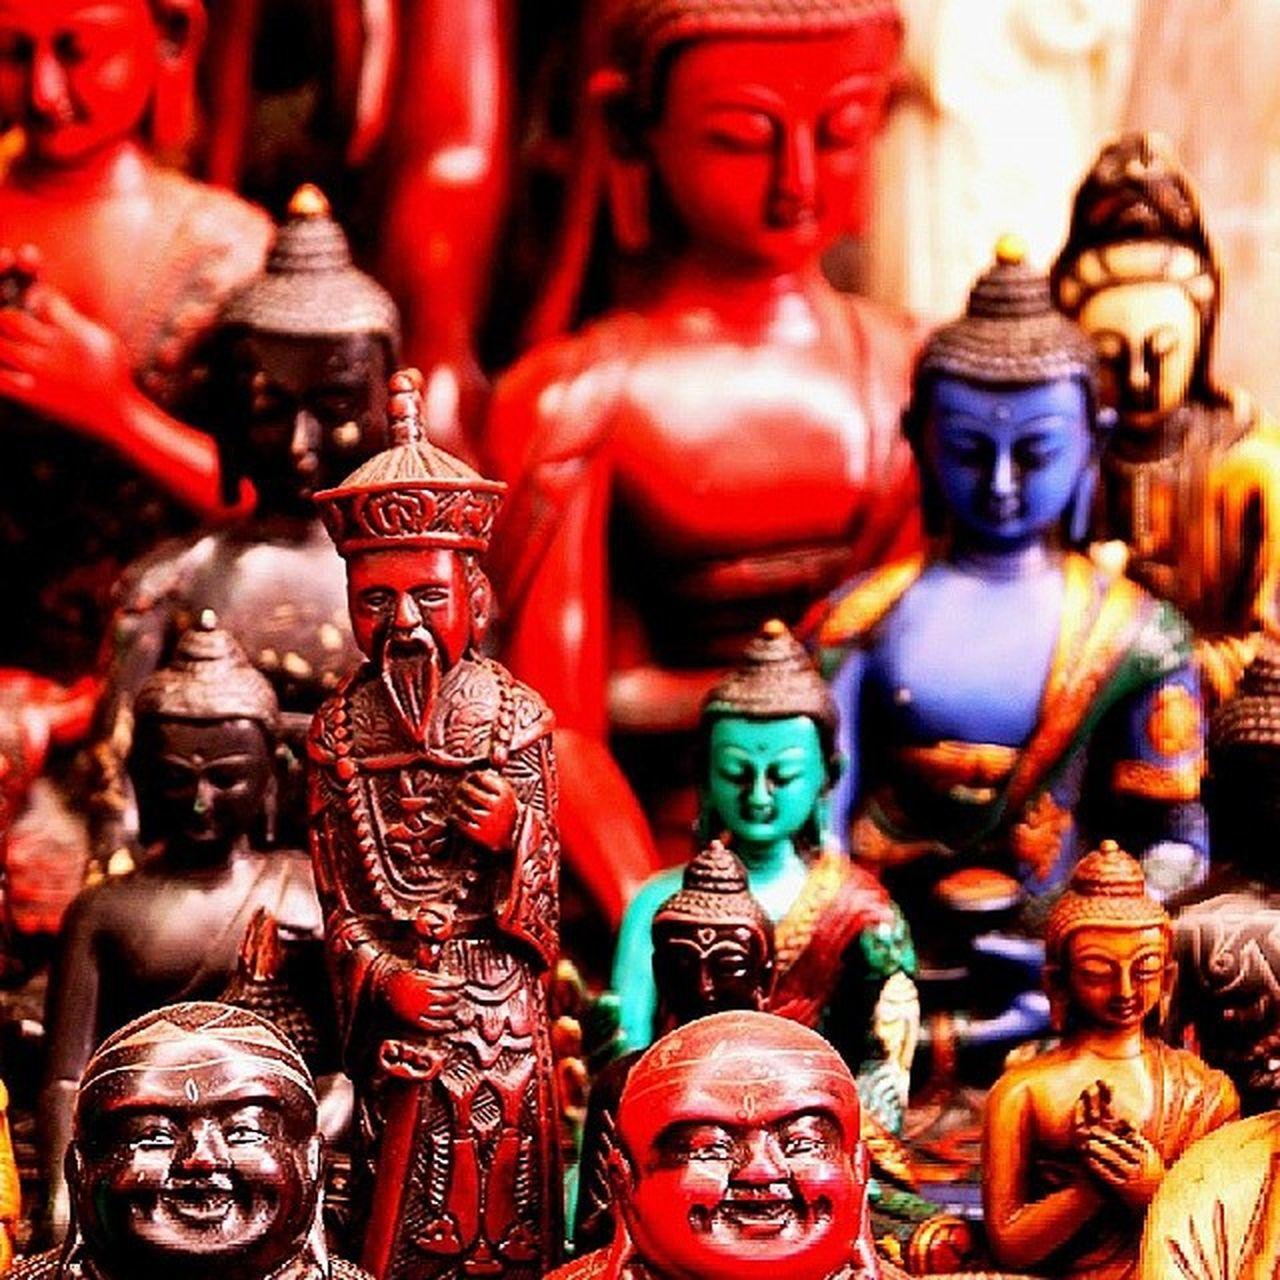 Nepal MotoTrips Fair Buddha Laughing_Buddha Clayfigures Gallivant_Biking Gallivant Figures Soulrider Soul Buddhist